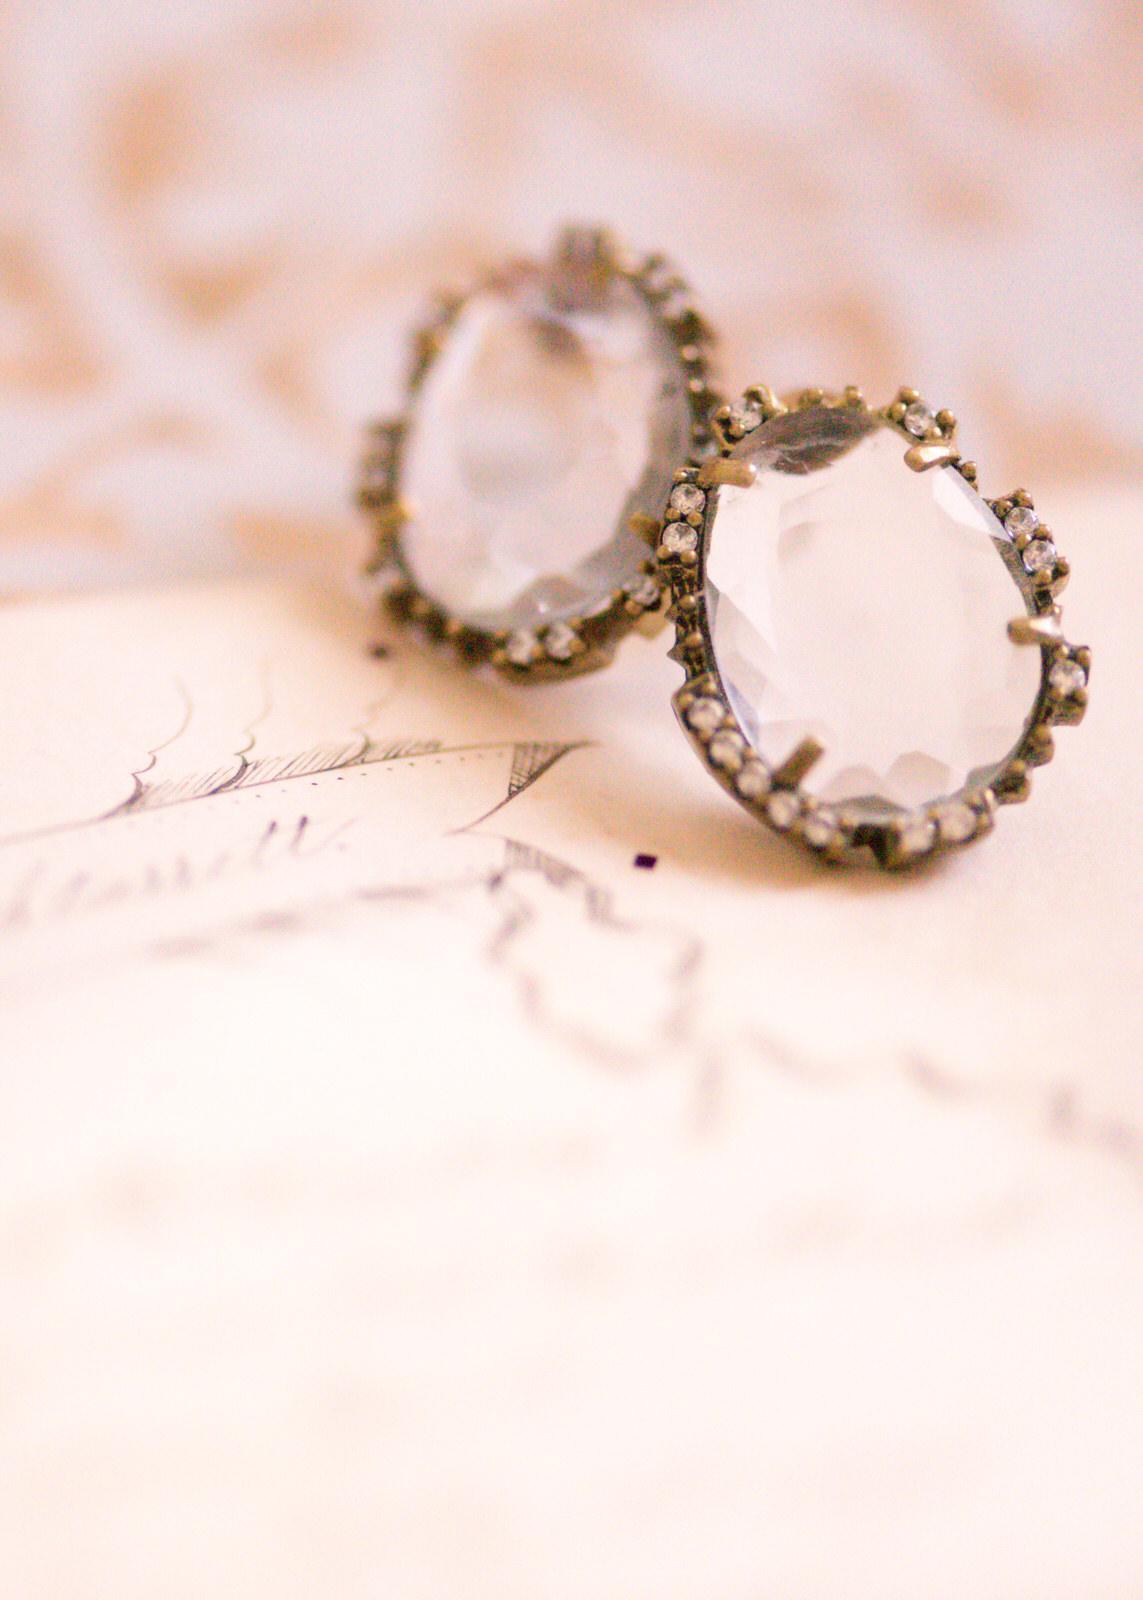 Vintage Bridal Jewelry Anthropologie Earrings Woodinville Seattle Wedding.jpg